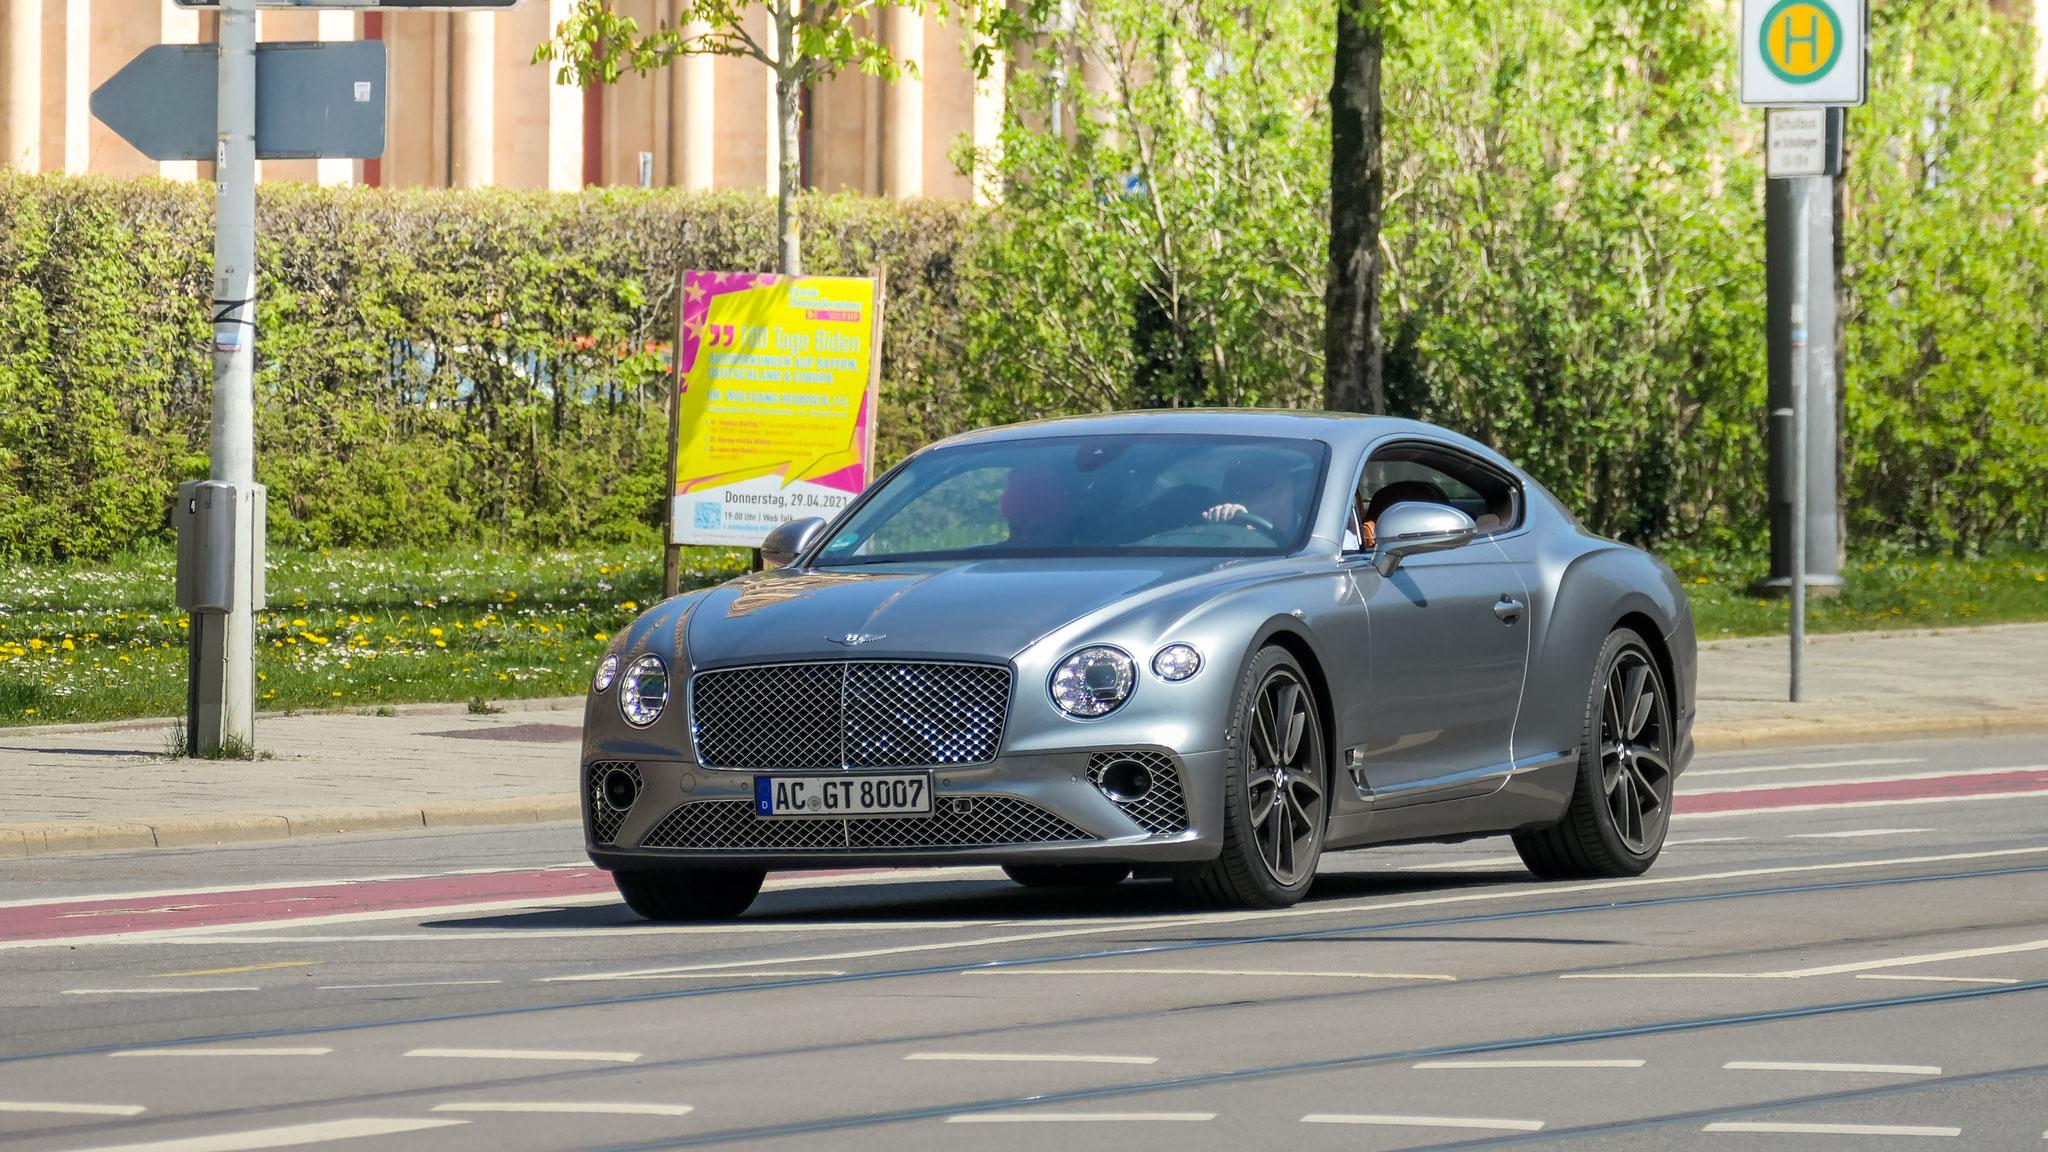 Bentley Continental GT - AC-GT-8007